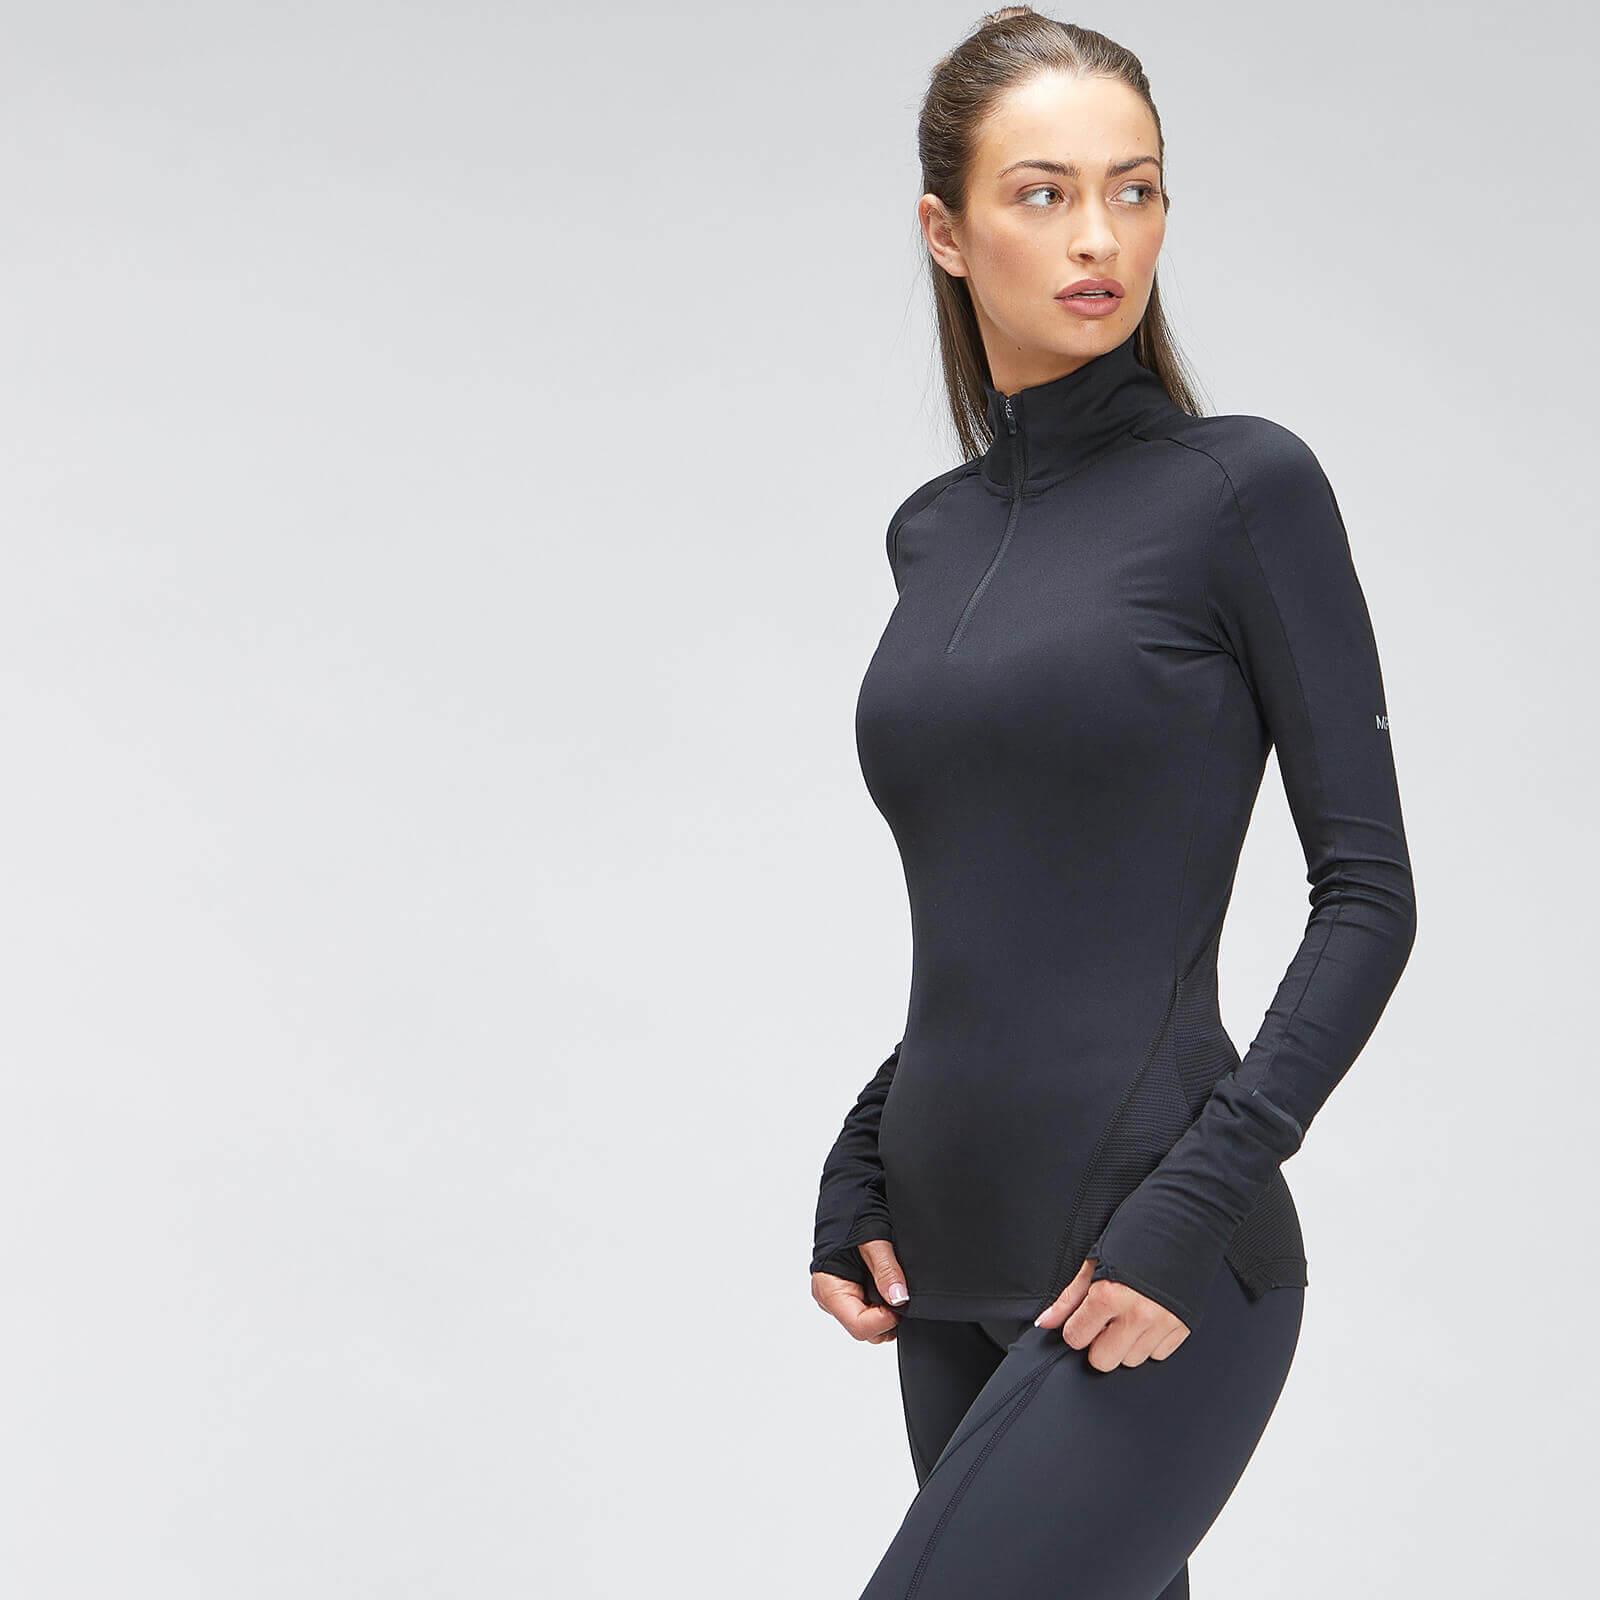 Купить MP Women's Velocity 1/4 Zip - Black - XXS, Myprotein International